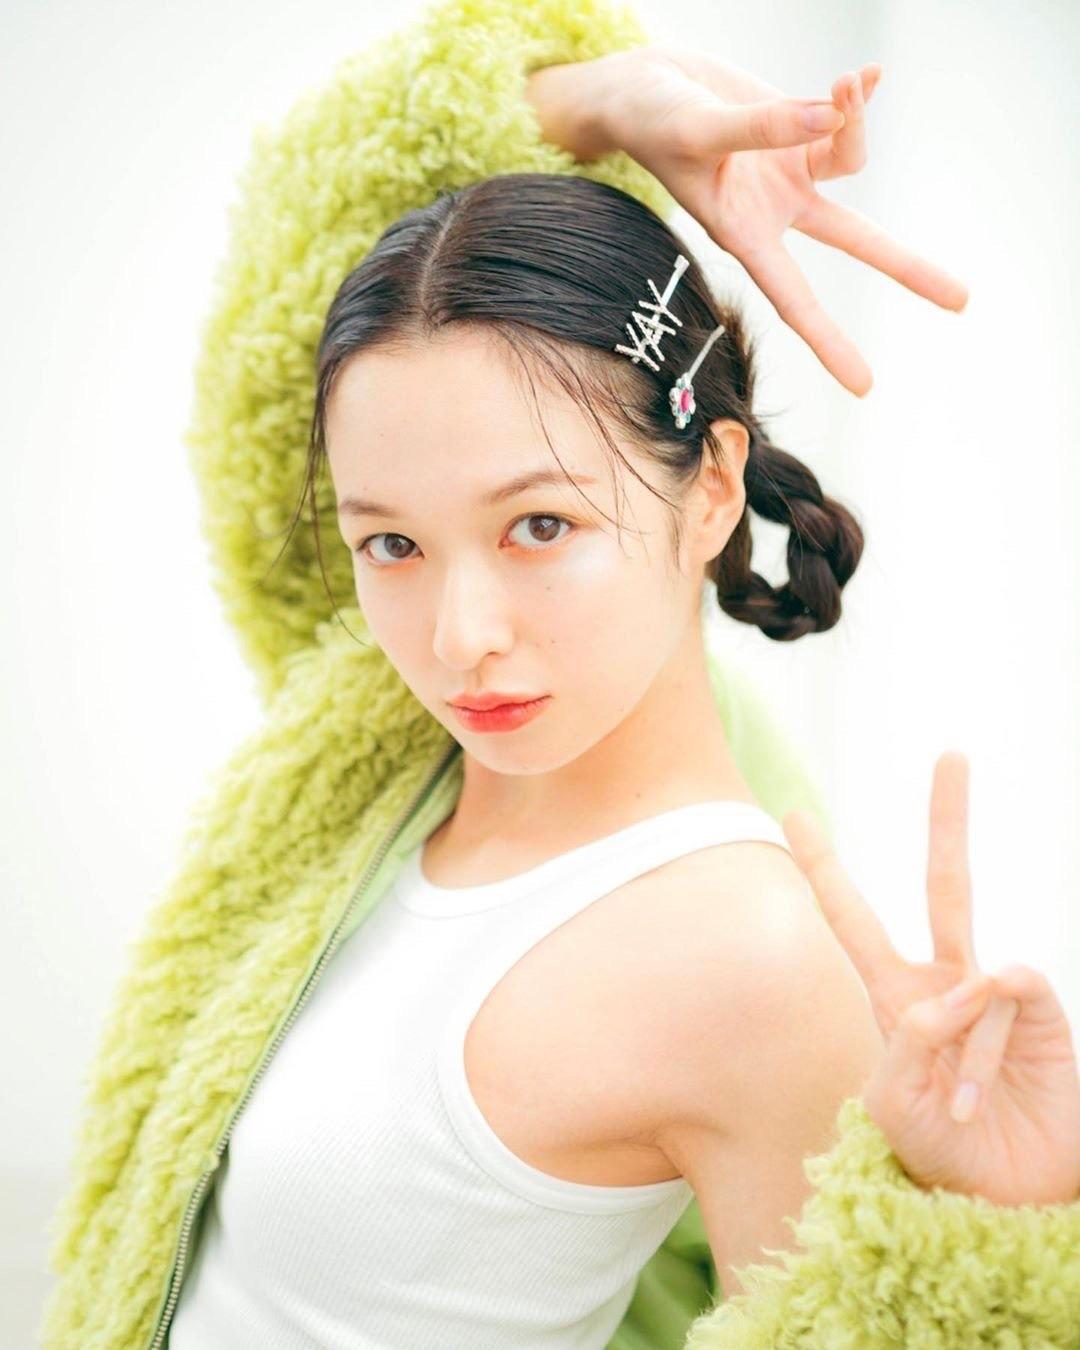 Erika Mori 森絵梨佳 in 2020 Japanese beauty, Actor model